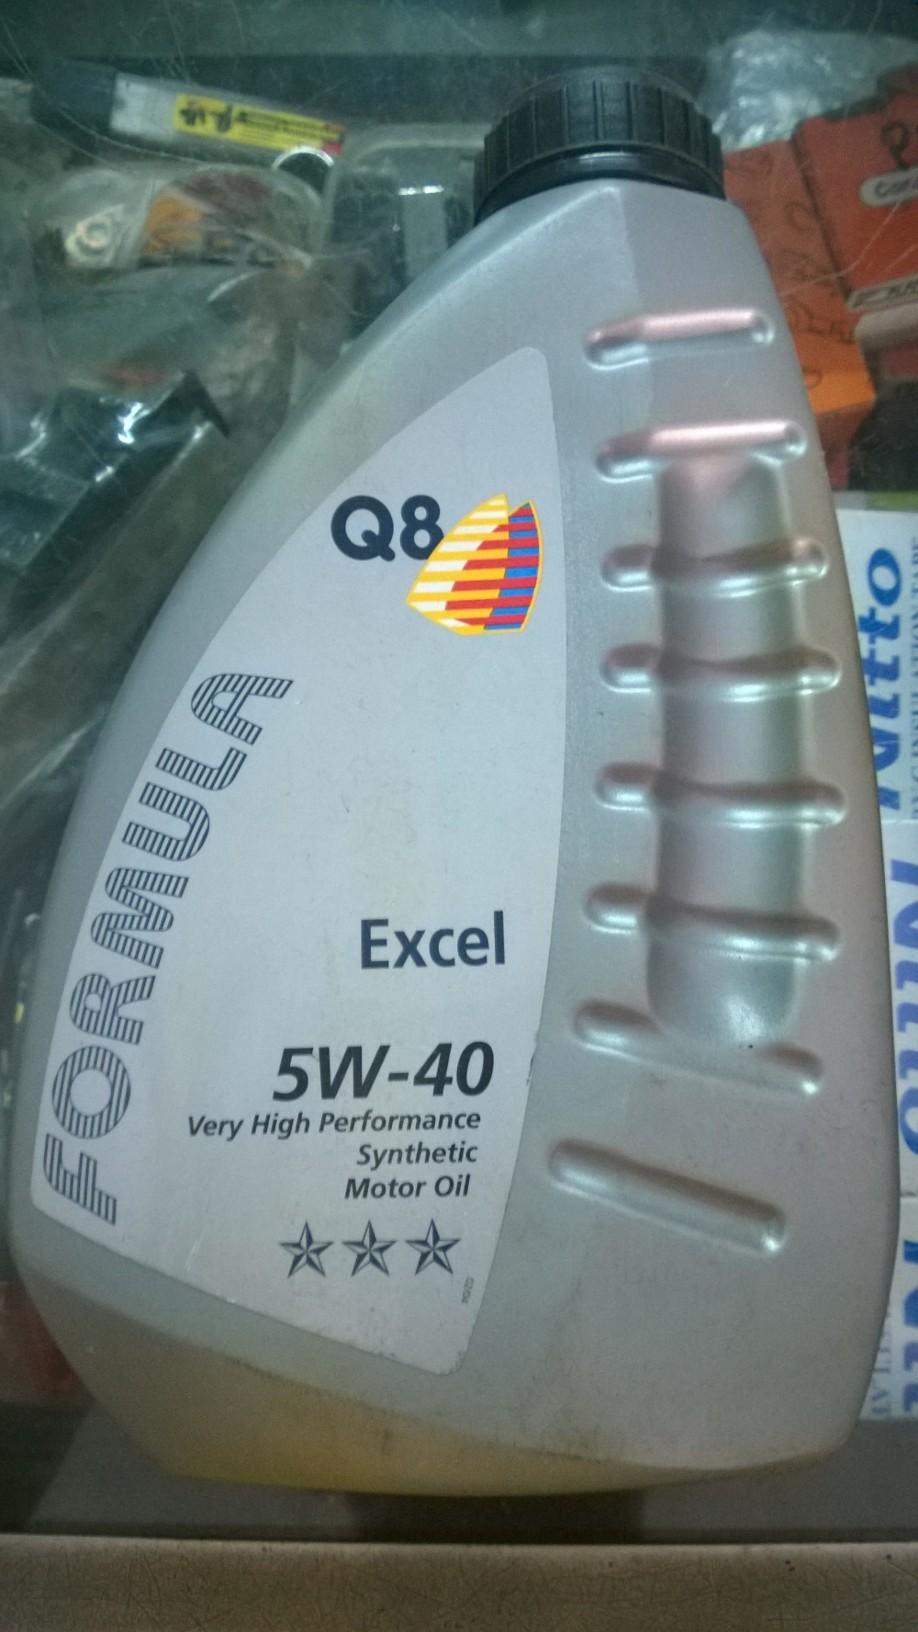 Jual Shell Rimula R3 Turbo 1 L 15w Oli Mobil Q8 Welcome To Www Sae 5w 30 Special G D1 Longlife Api Sn Kemasan Liter Original Formula Excel 40 Cf 1liter